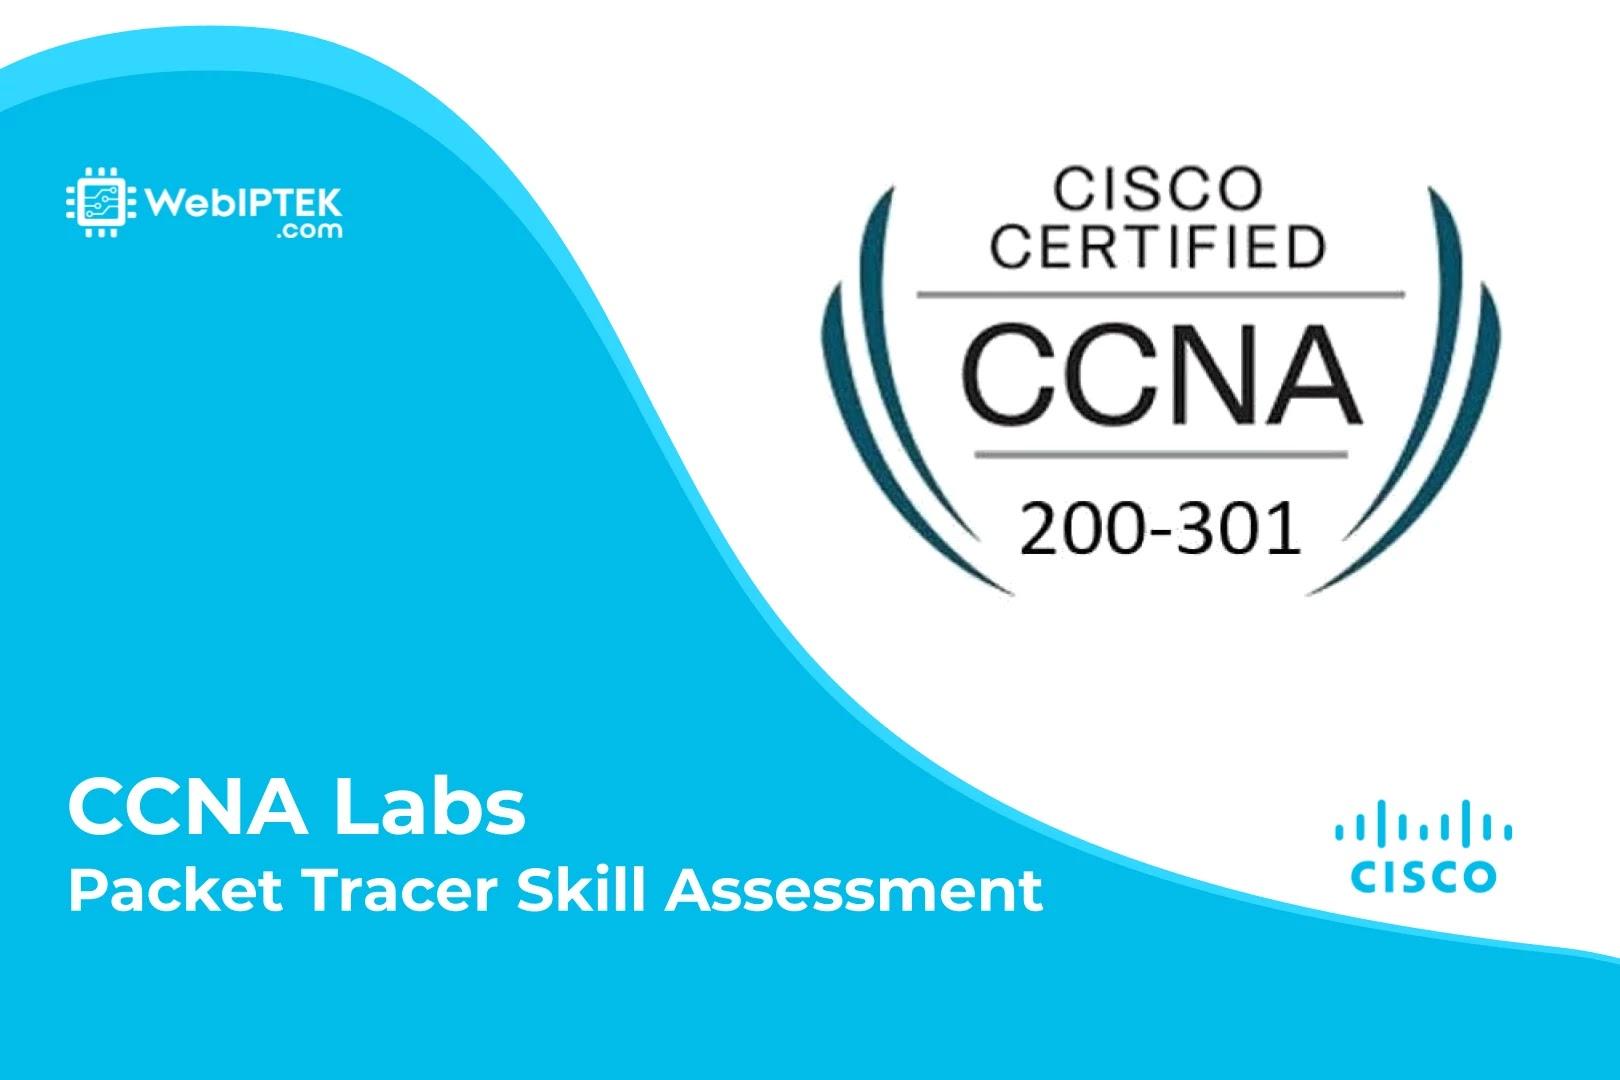 CCNA Labs